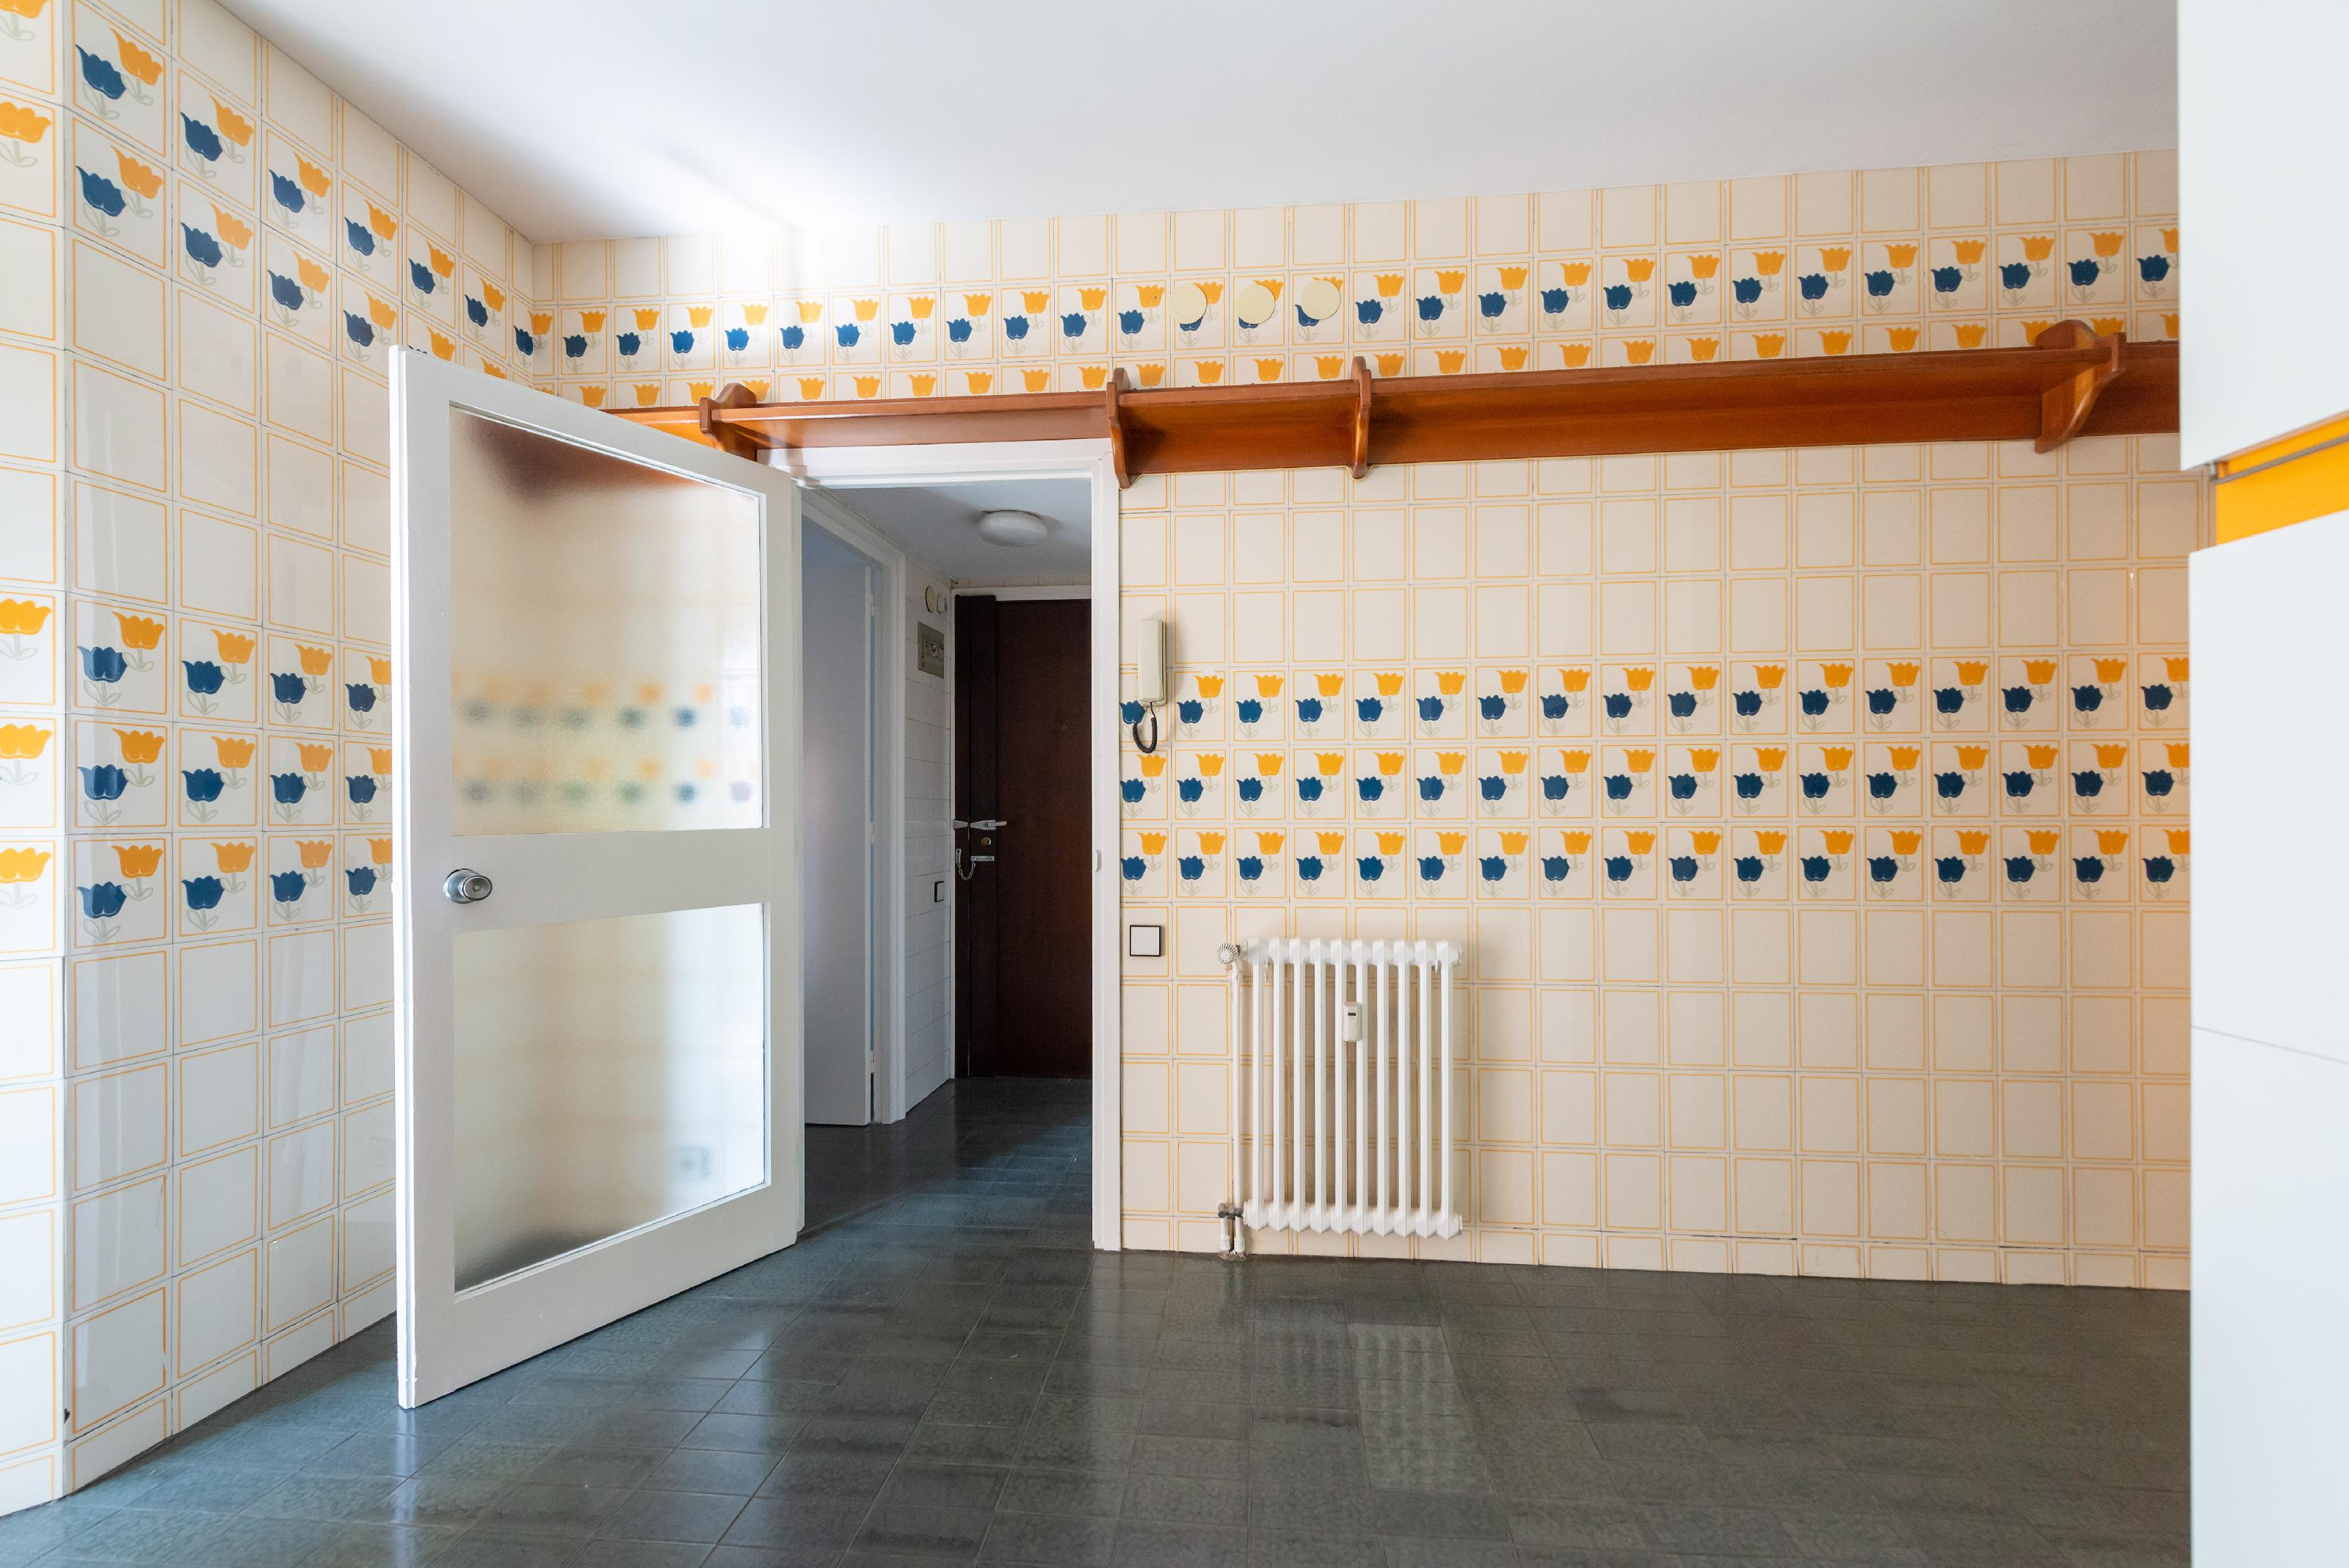 253470 Flat for sale in Sarrià-Sant Gervasi, El Putxet and Farró 27